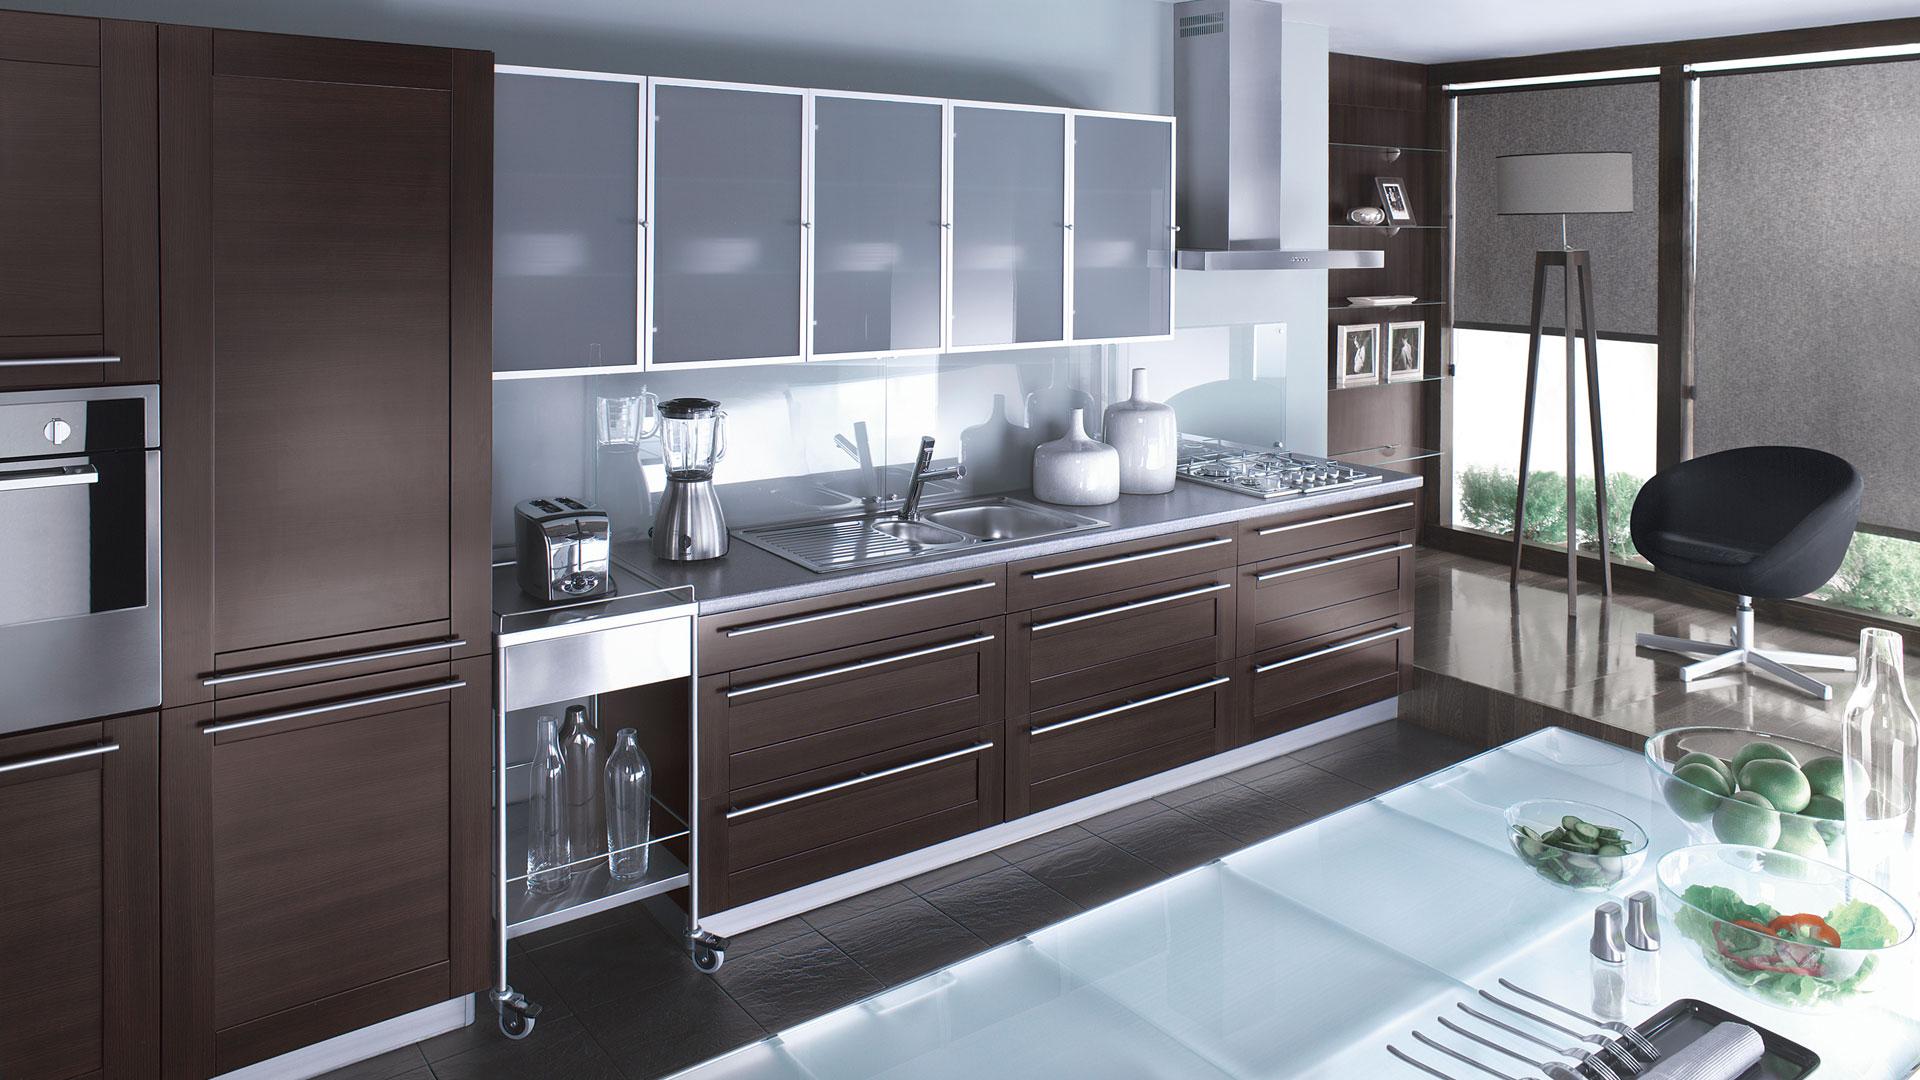 Residential 171 Aluminum Glass Cabinet Doors